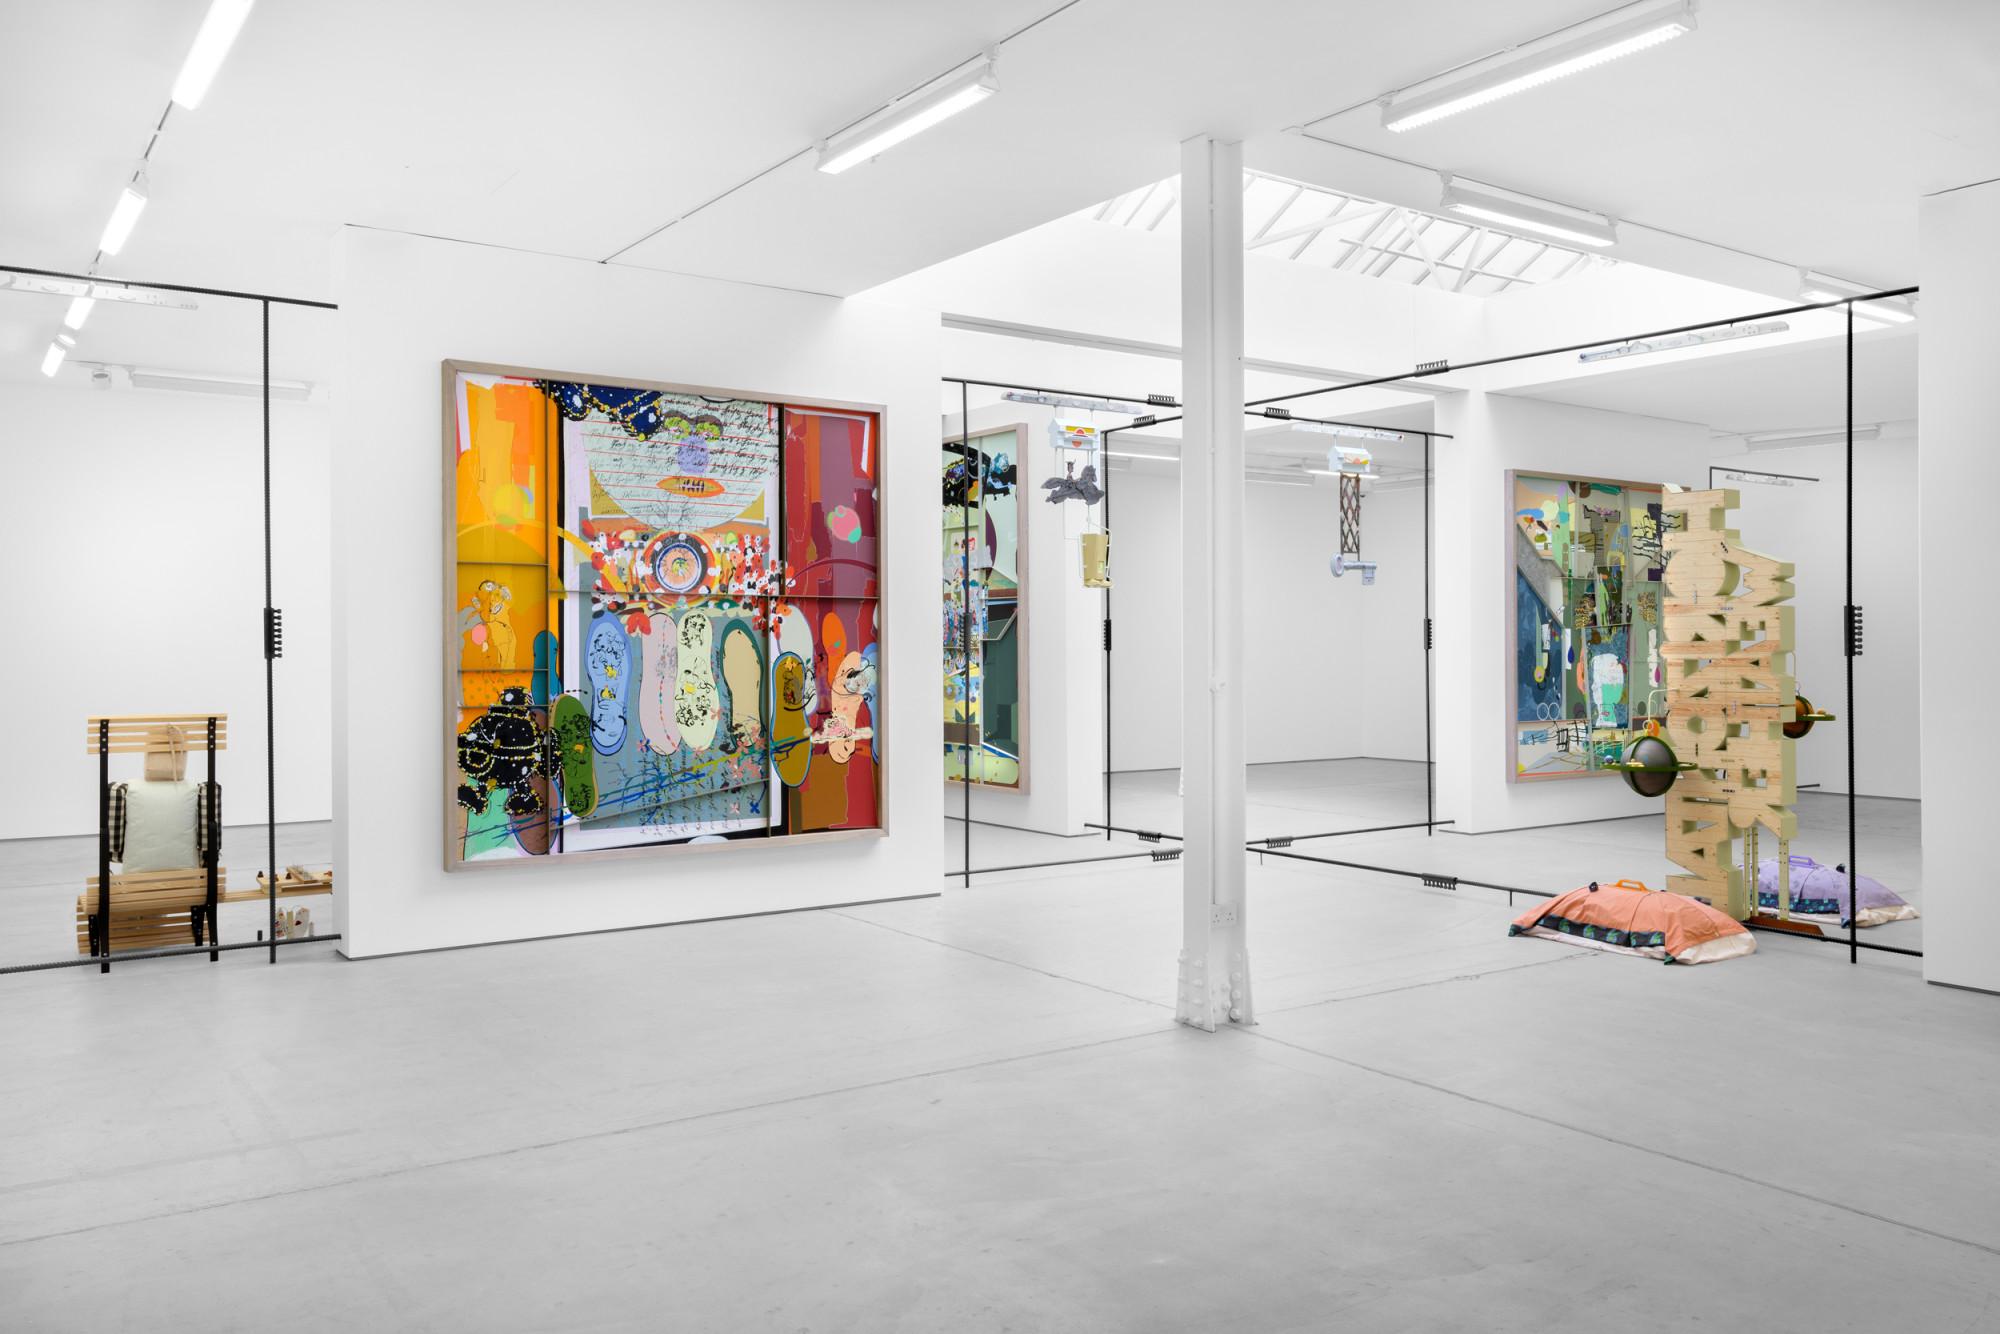 "<div class=""artwork_caption""><p>Installation view, Helen Marten, <em>Sparrows On the Stone</em>, Sadie Coles HQ, 62 Kingly Street W1, 04 September – 30 October 2021</p><p>Photography by Eva Herzog</p></div>"